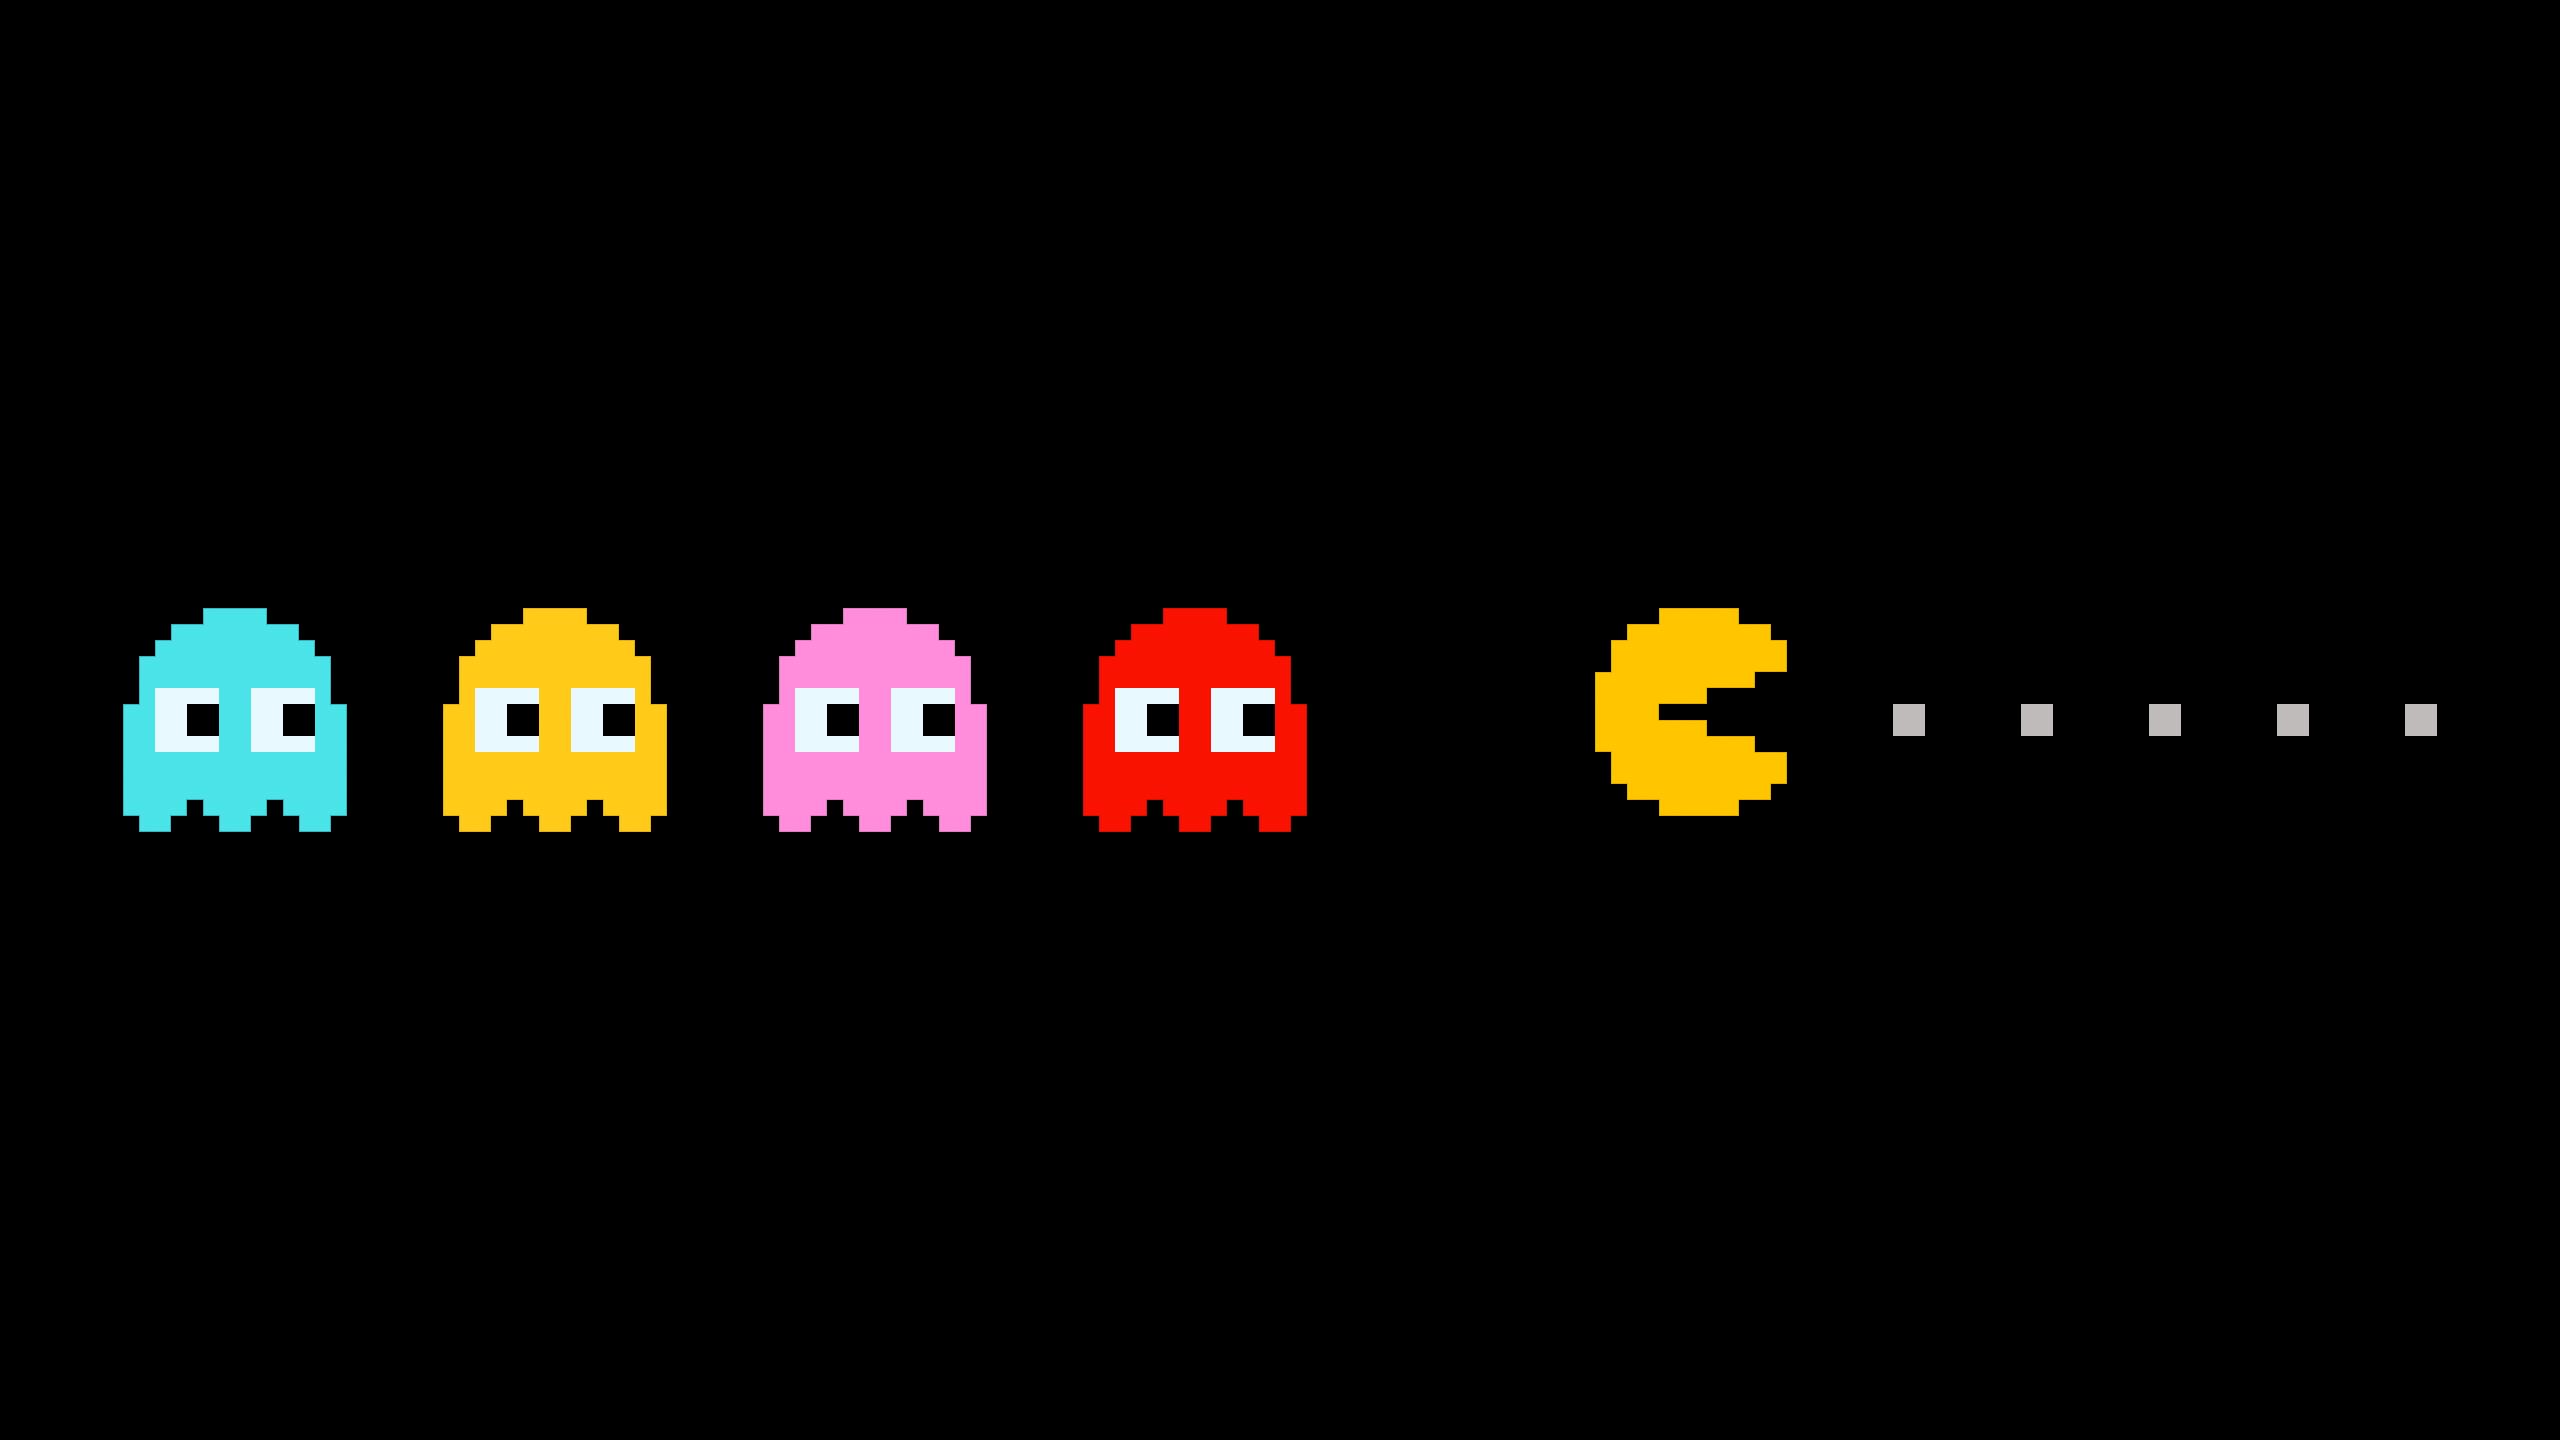 Pin By Ali Mcdonough On Art 7 In 2019 Pinterest Pixel Pacman